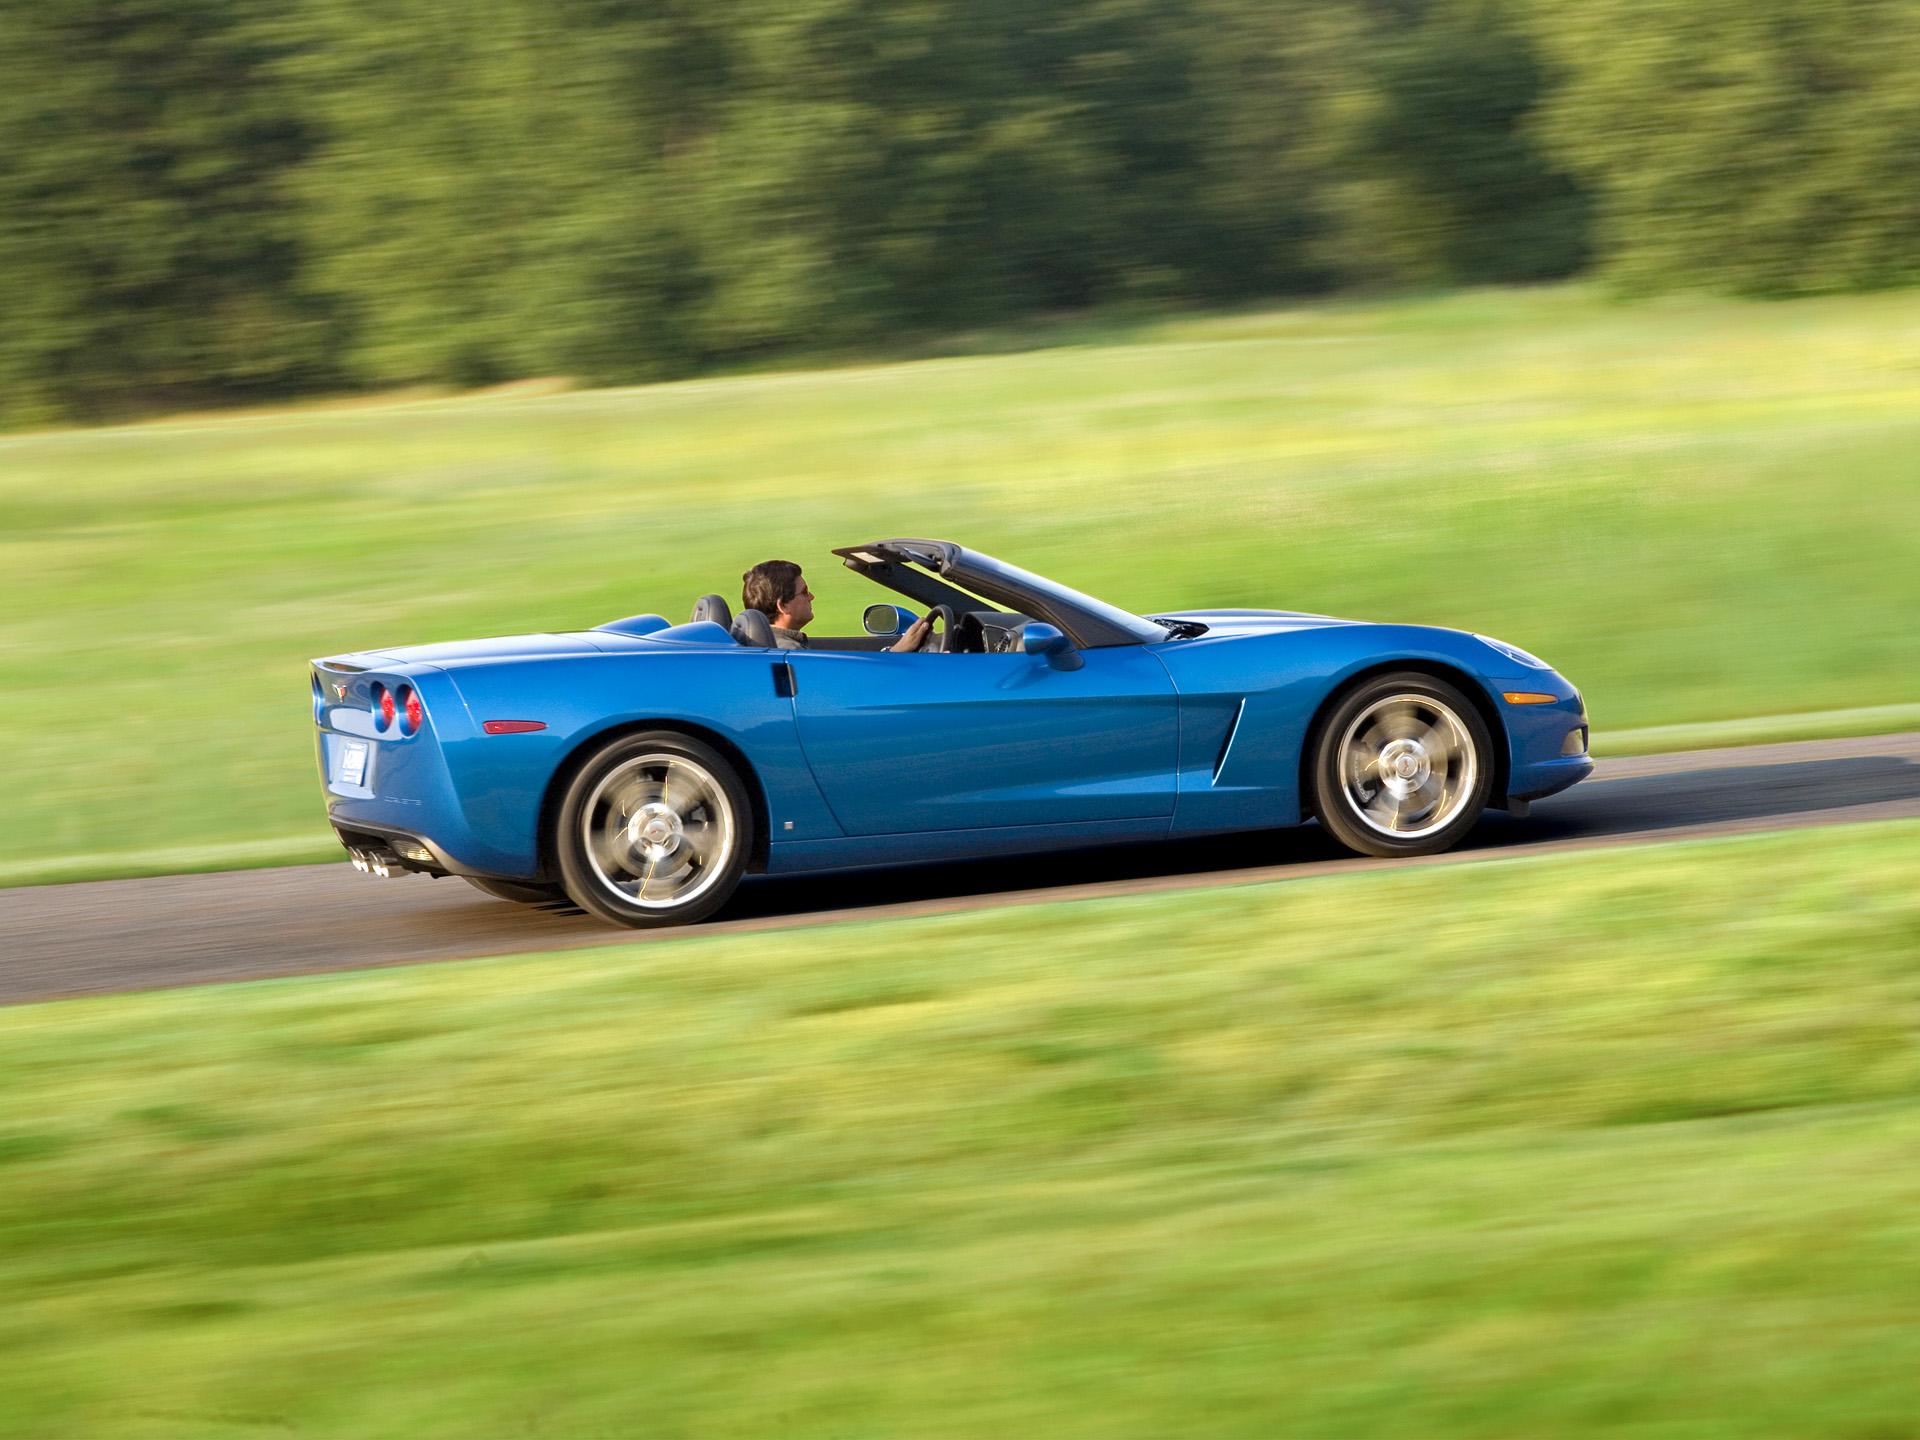 C6 Corvette For Sale In Texarkana Autos Post